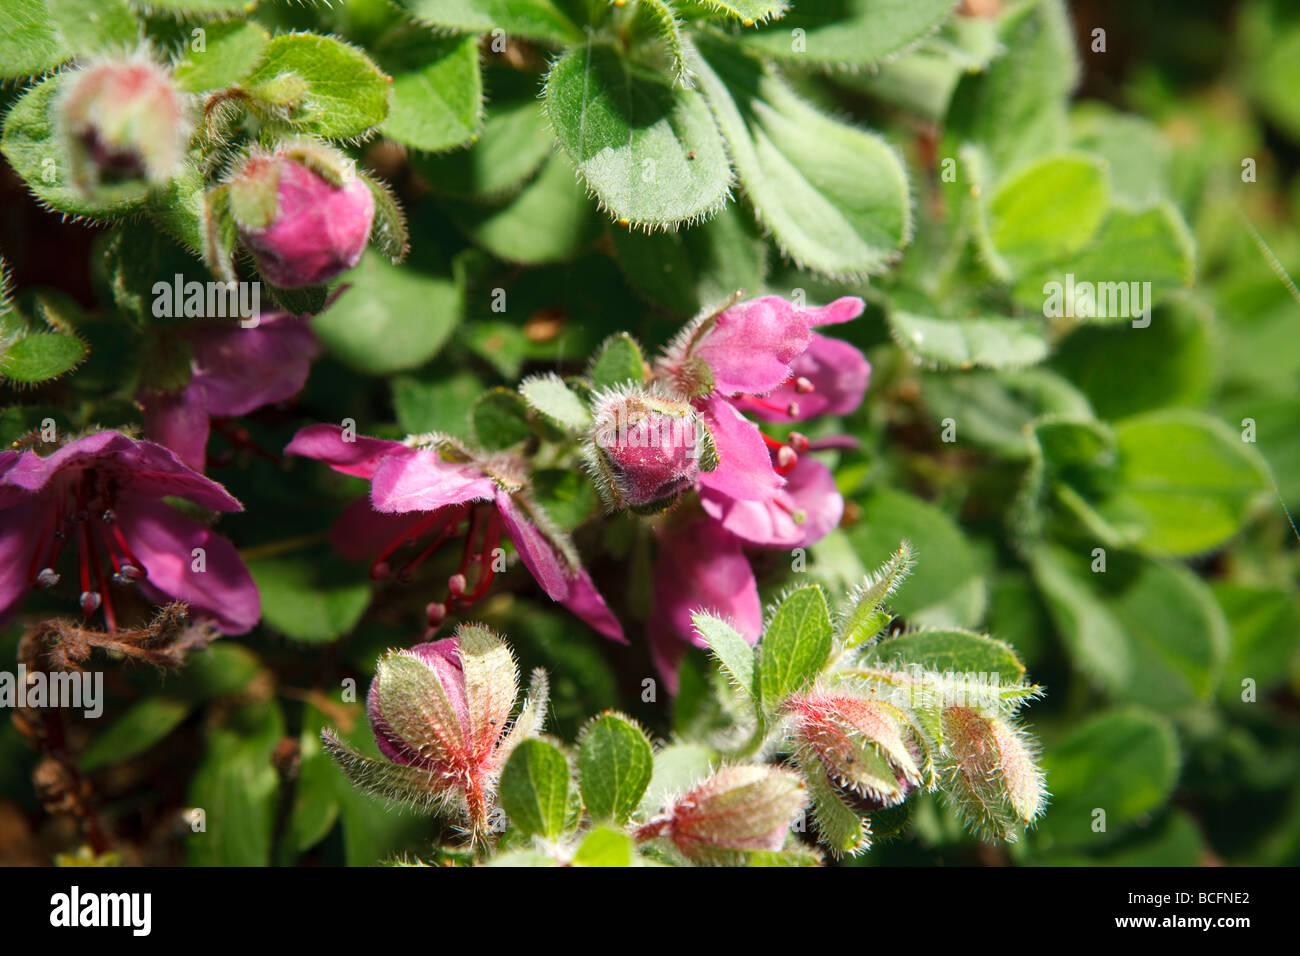 Kamchatka Rhododendron , Kamtjatkaazalea (Rhododendron camtschaticum) - Stock Image